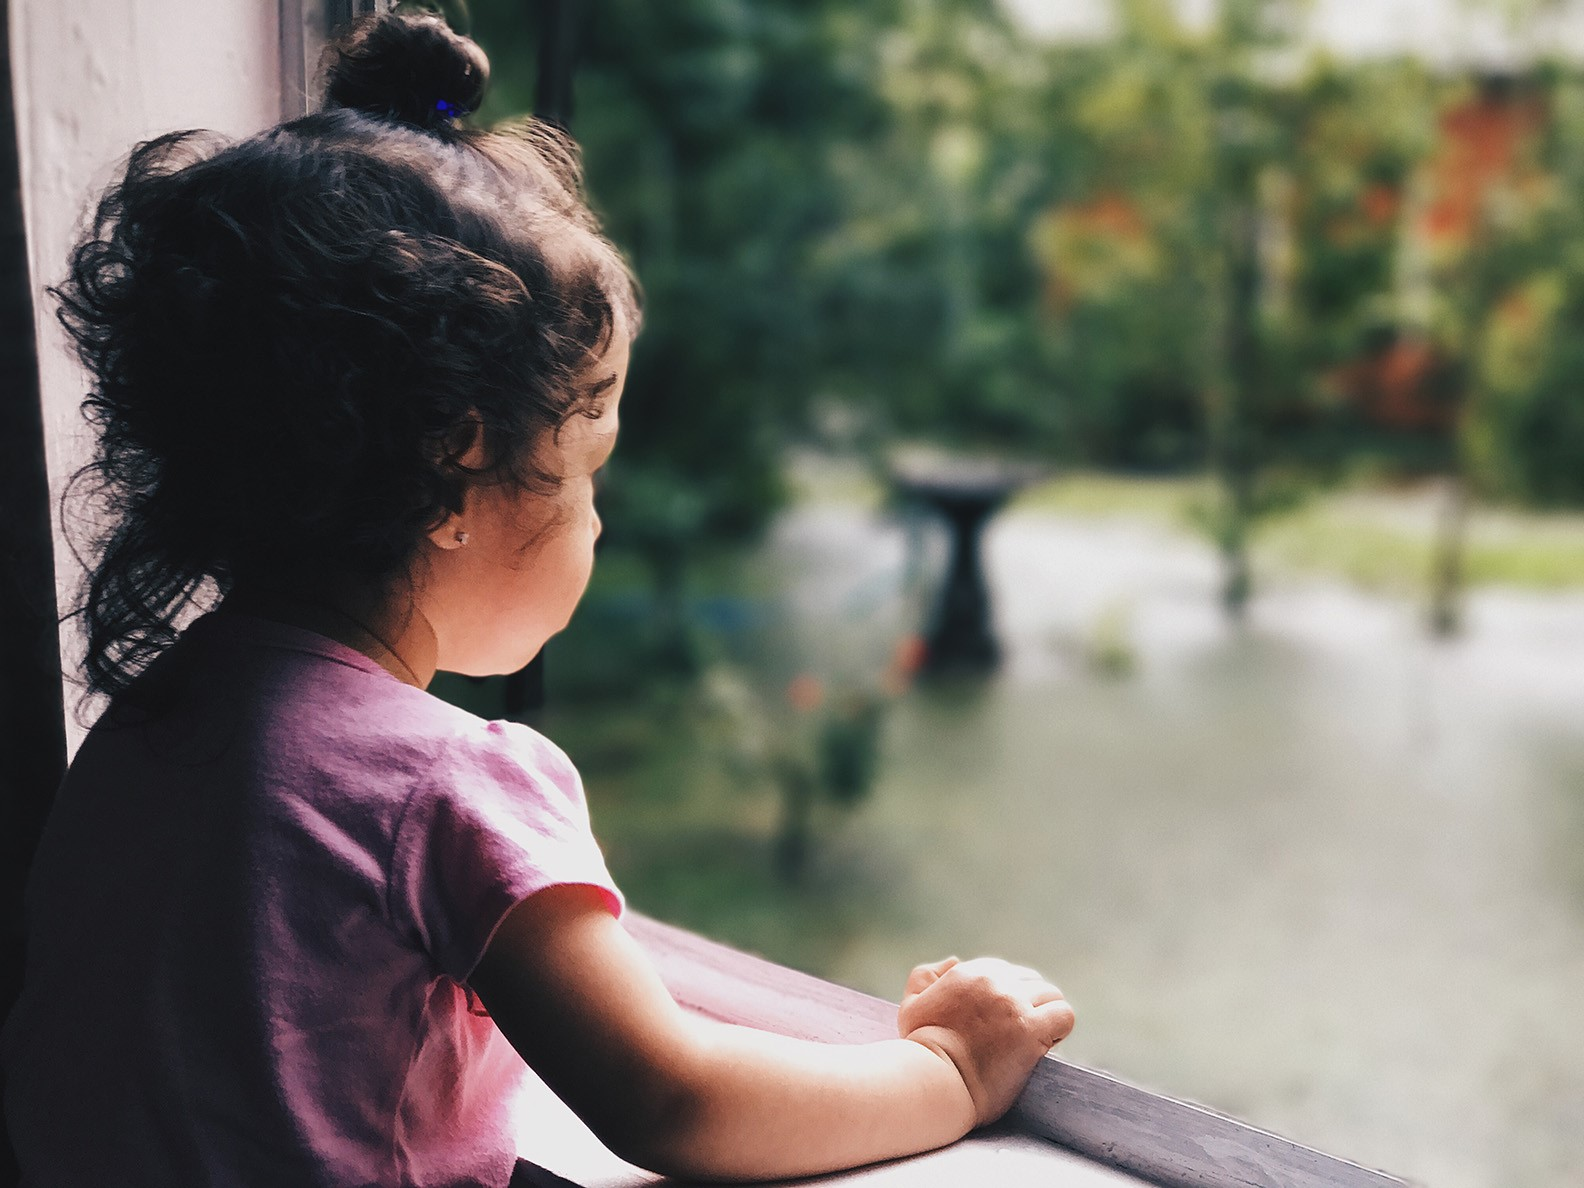 Eye on Houston 2018 - Yzette Torres, The Effects of Harvey